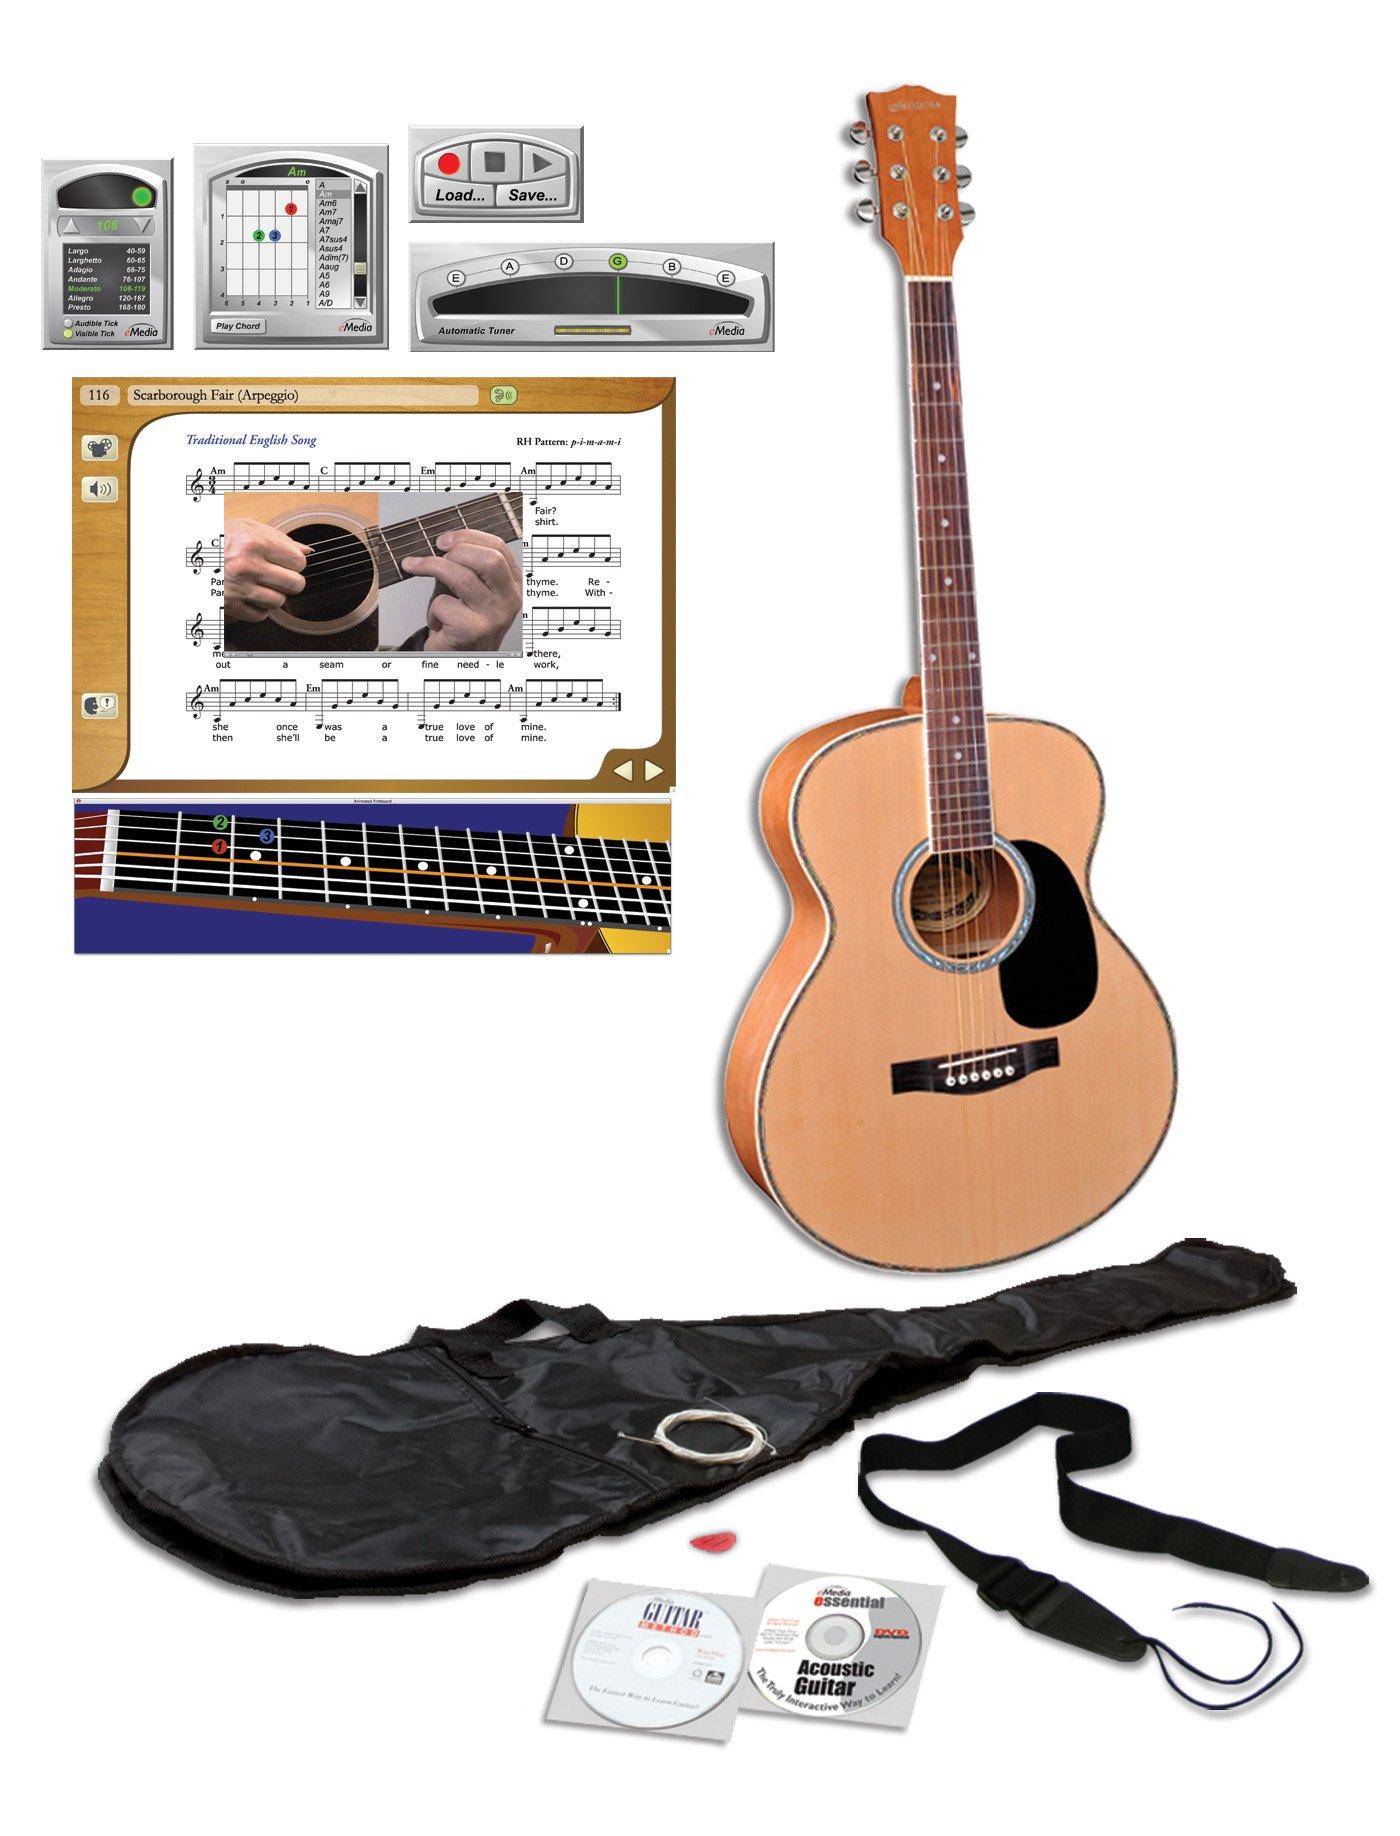 eMedia Teach Yourself Acoustic Guitar Pack (Steel-String)